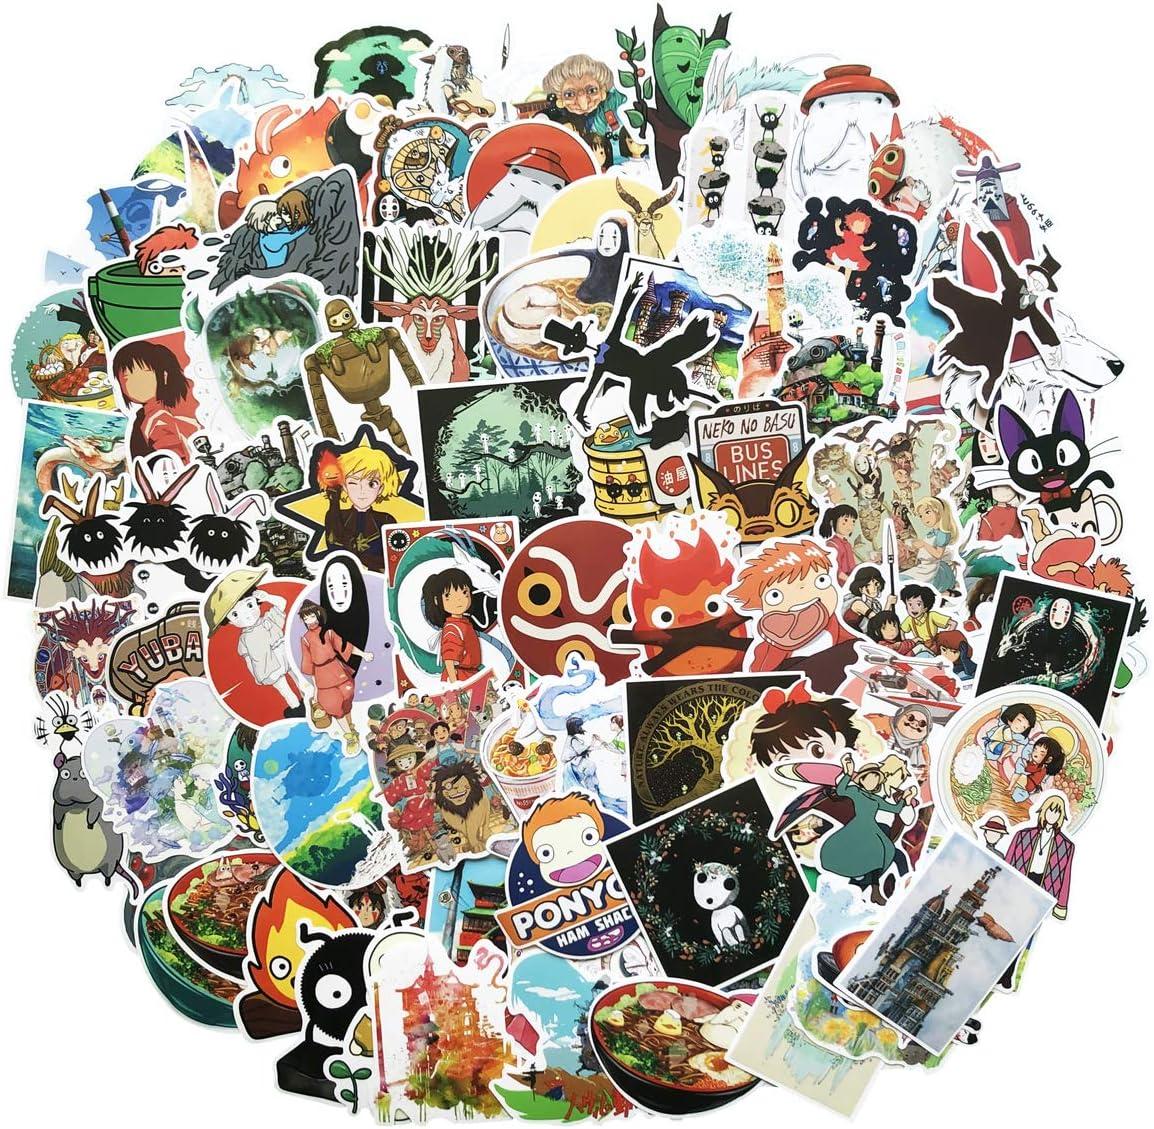 ZUIYIJIANGNAN 100Pack Miyazaki Hayao Animation Film Theme Stickers Set Random Sticker Decals for Water Bottle Laptop Cellphone Bicycle Motorcycle Car Bumper Luggage Travel Case. Etc